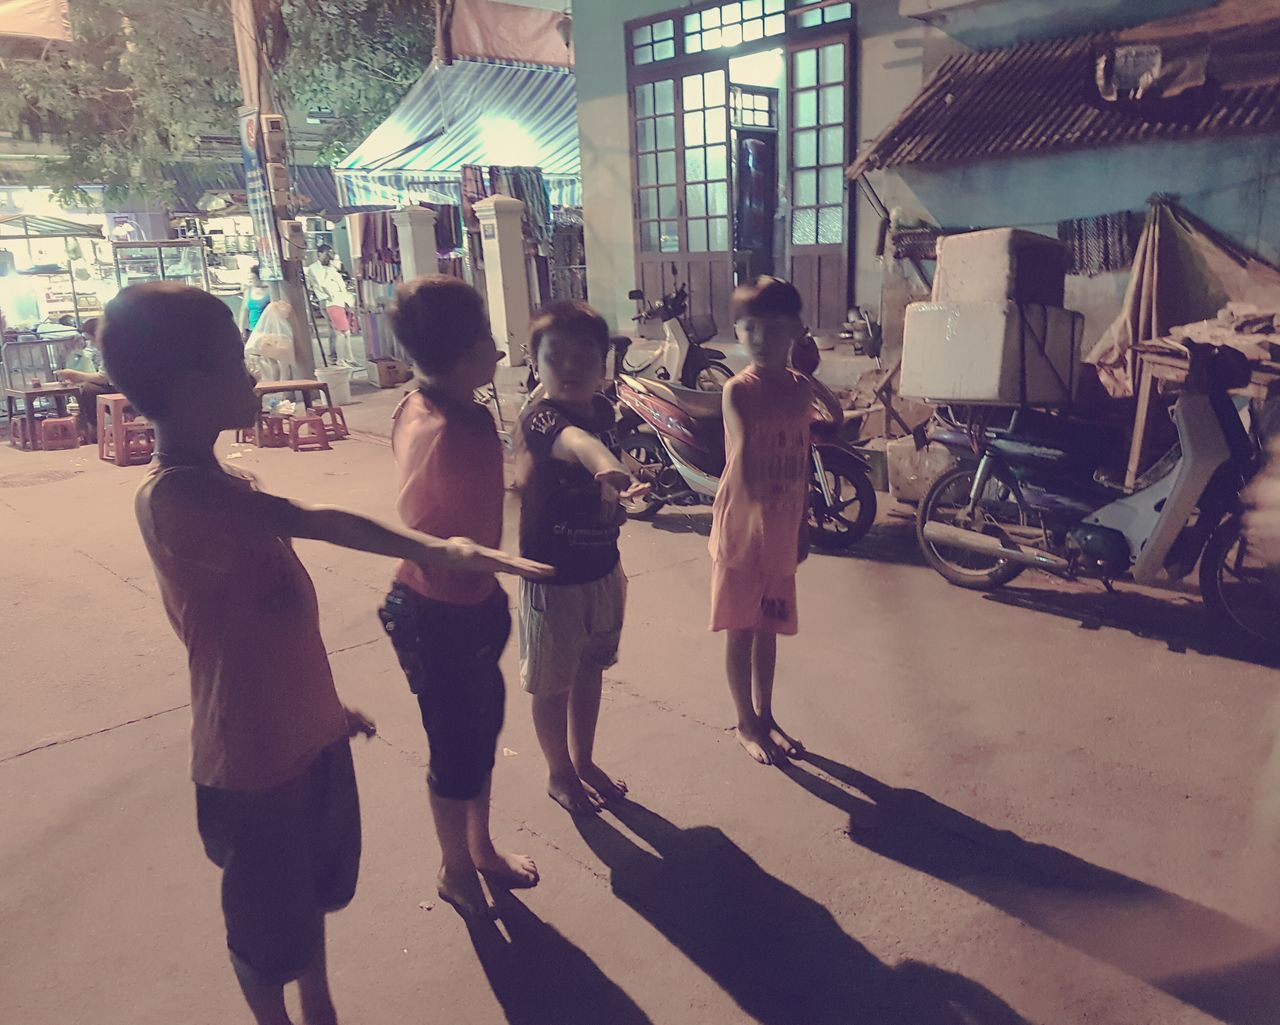 Hot Summer Night Boys Boys At Play Vietnam Hoi An Old Town